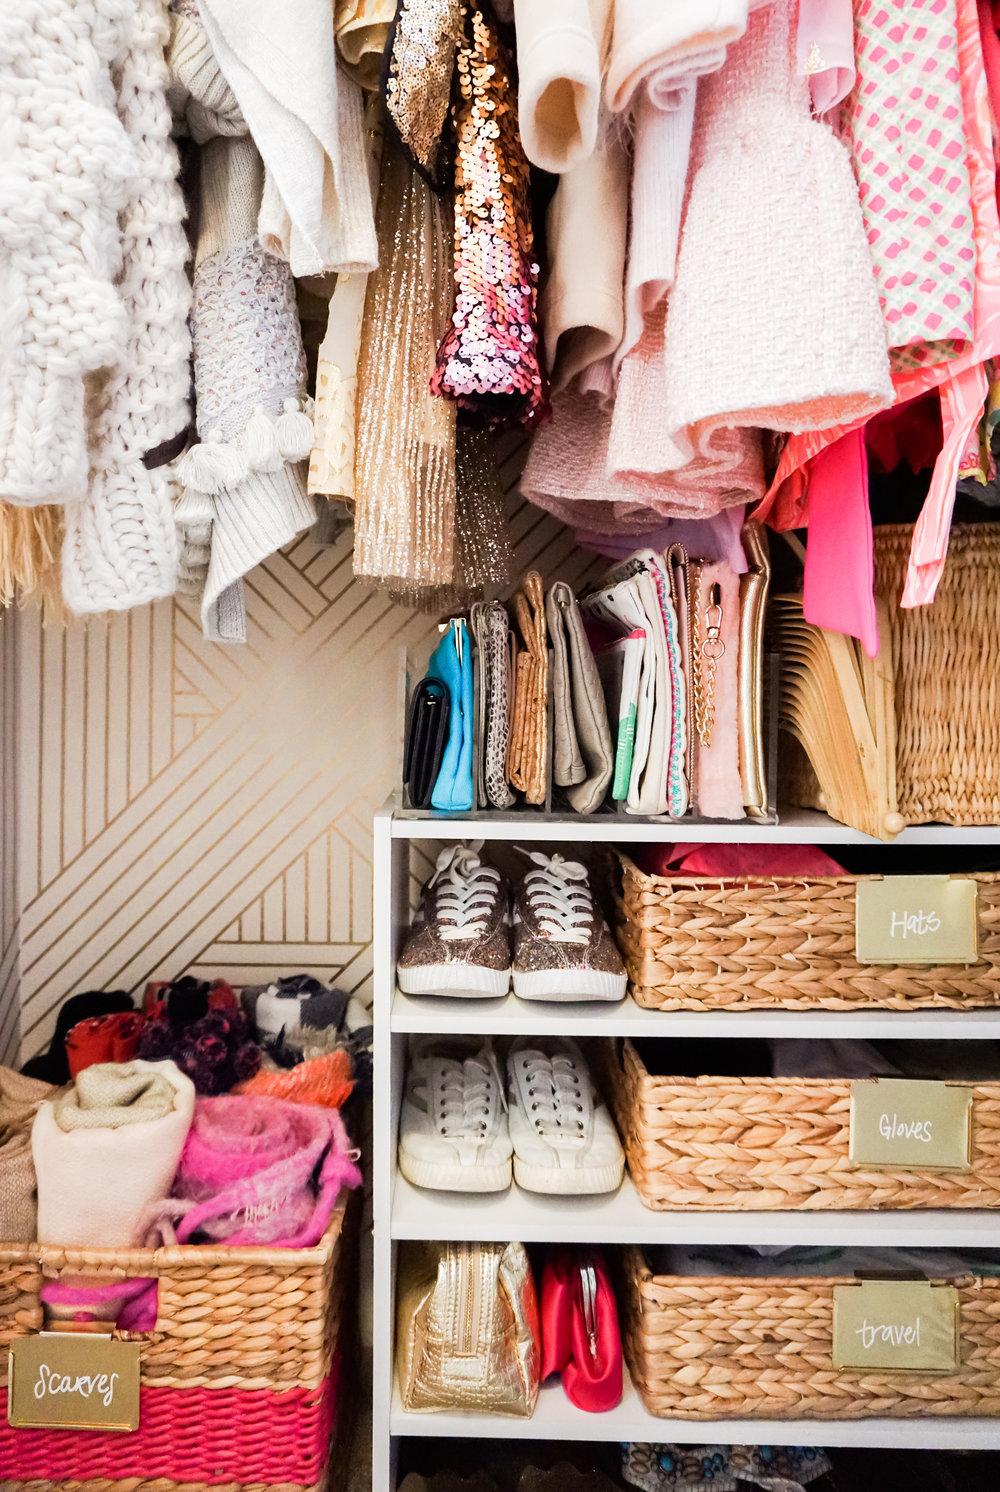 House of Turk | Closet Organization & Shoe Storage